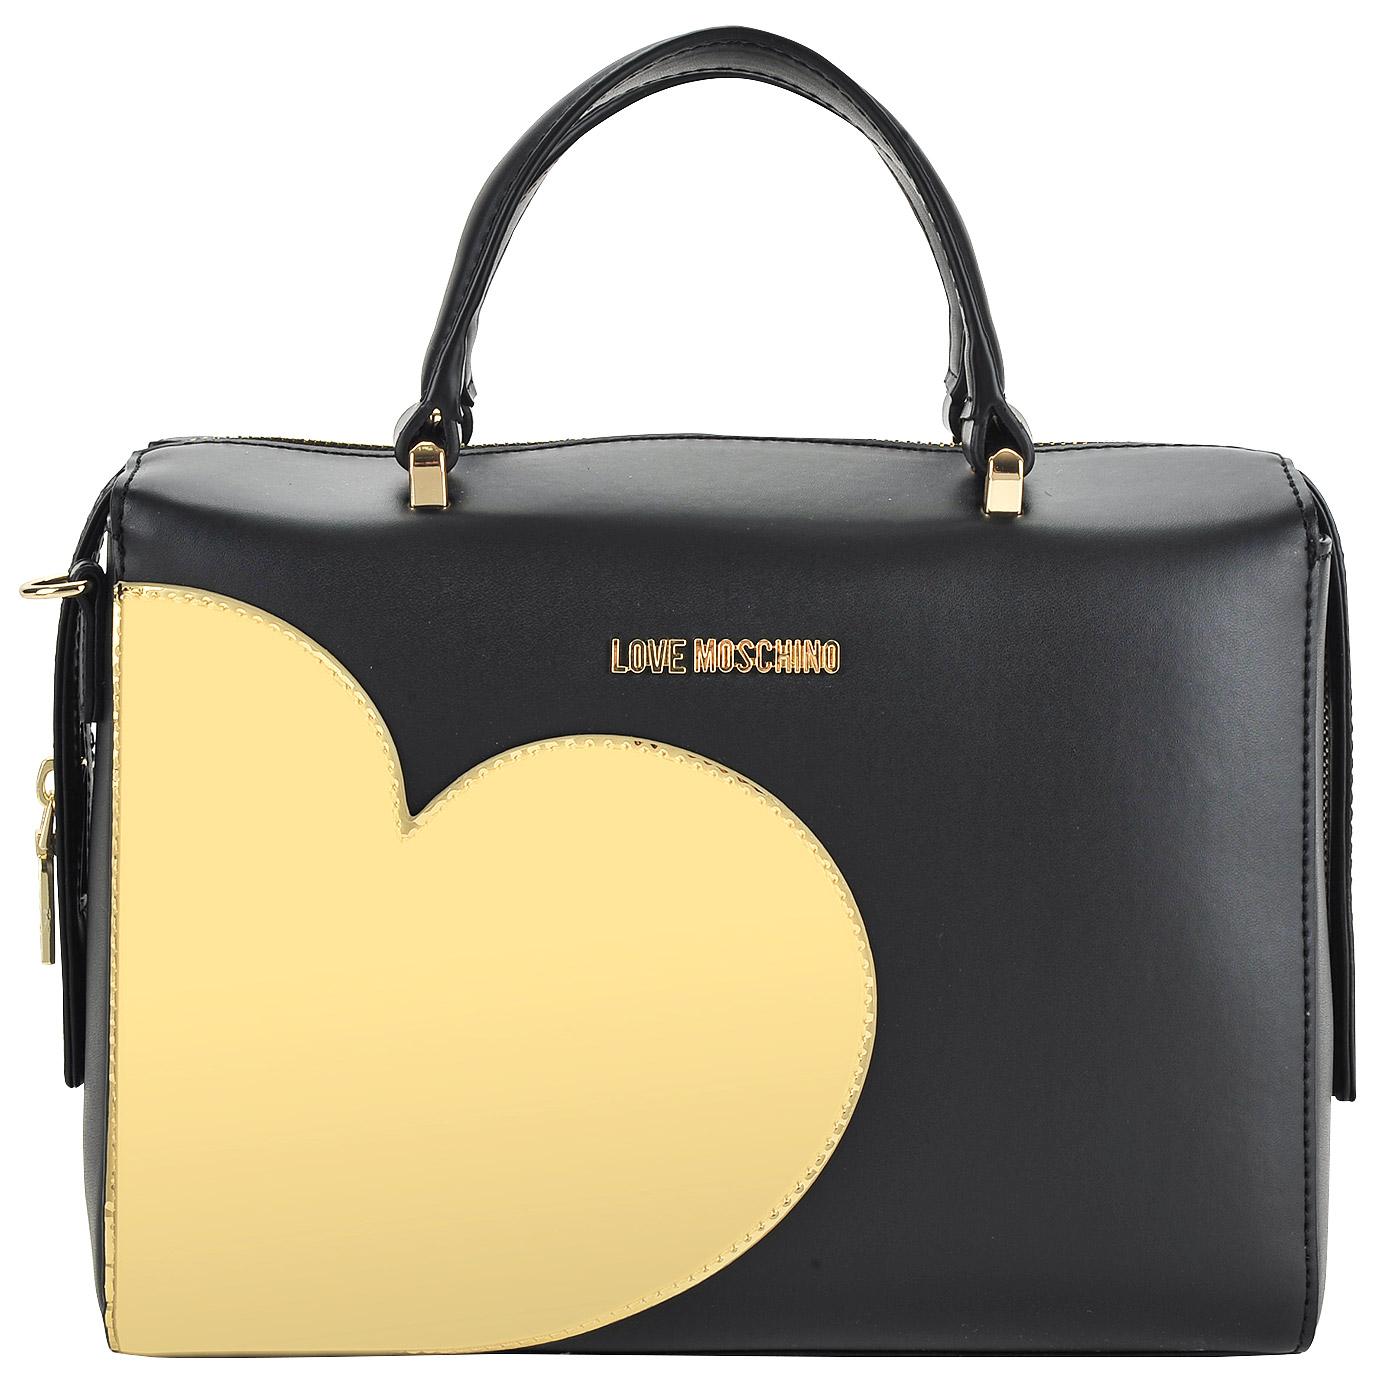 2f88dd3bed13 Женская черная сумка с золотой аппликацией в форме сердца Love Moschino  Gold heart ...